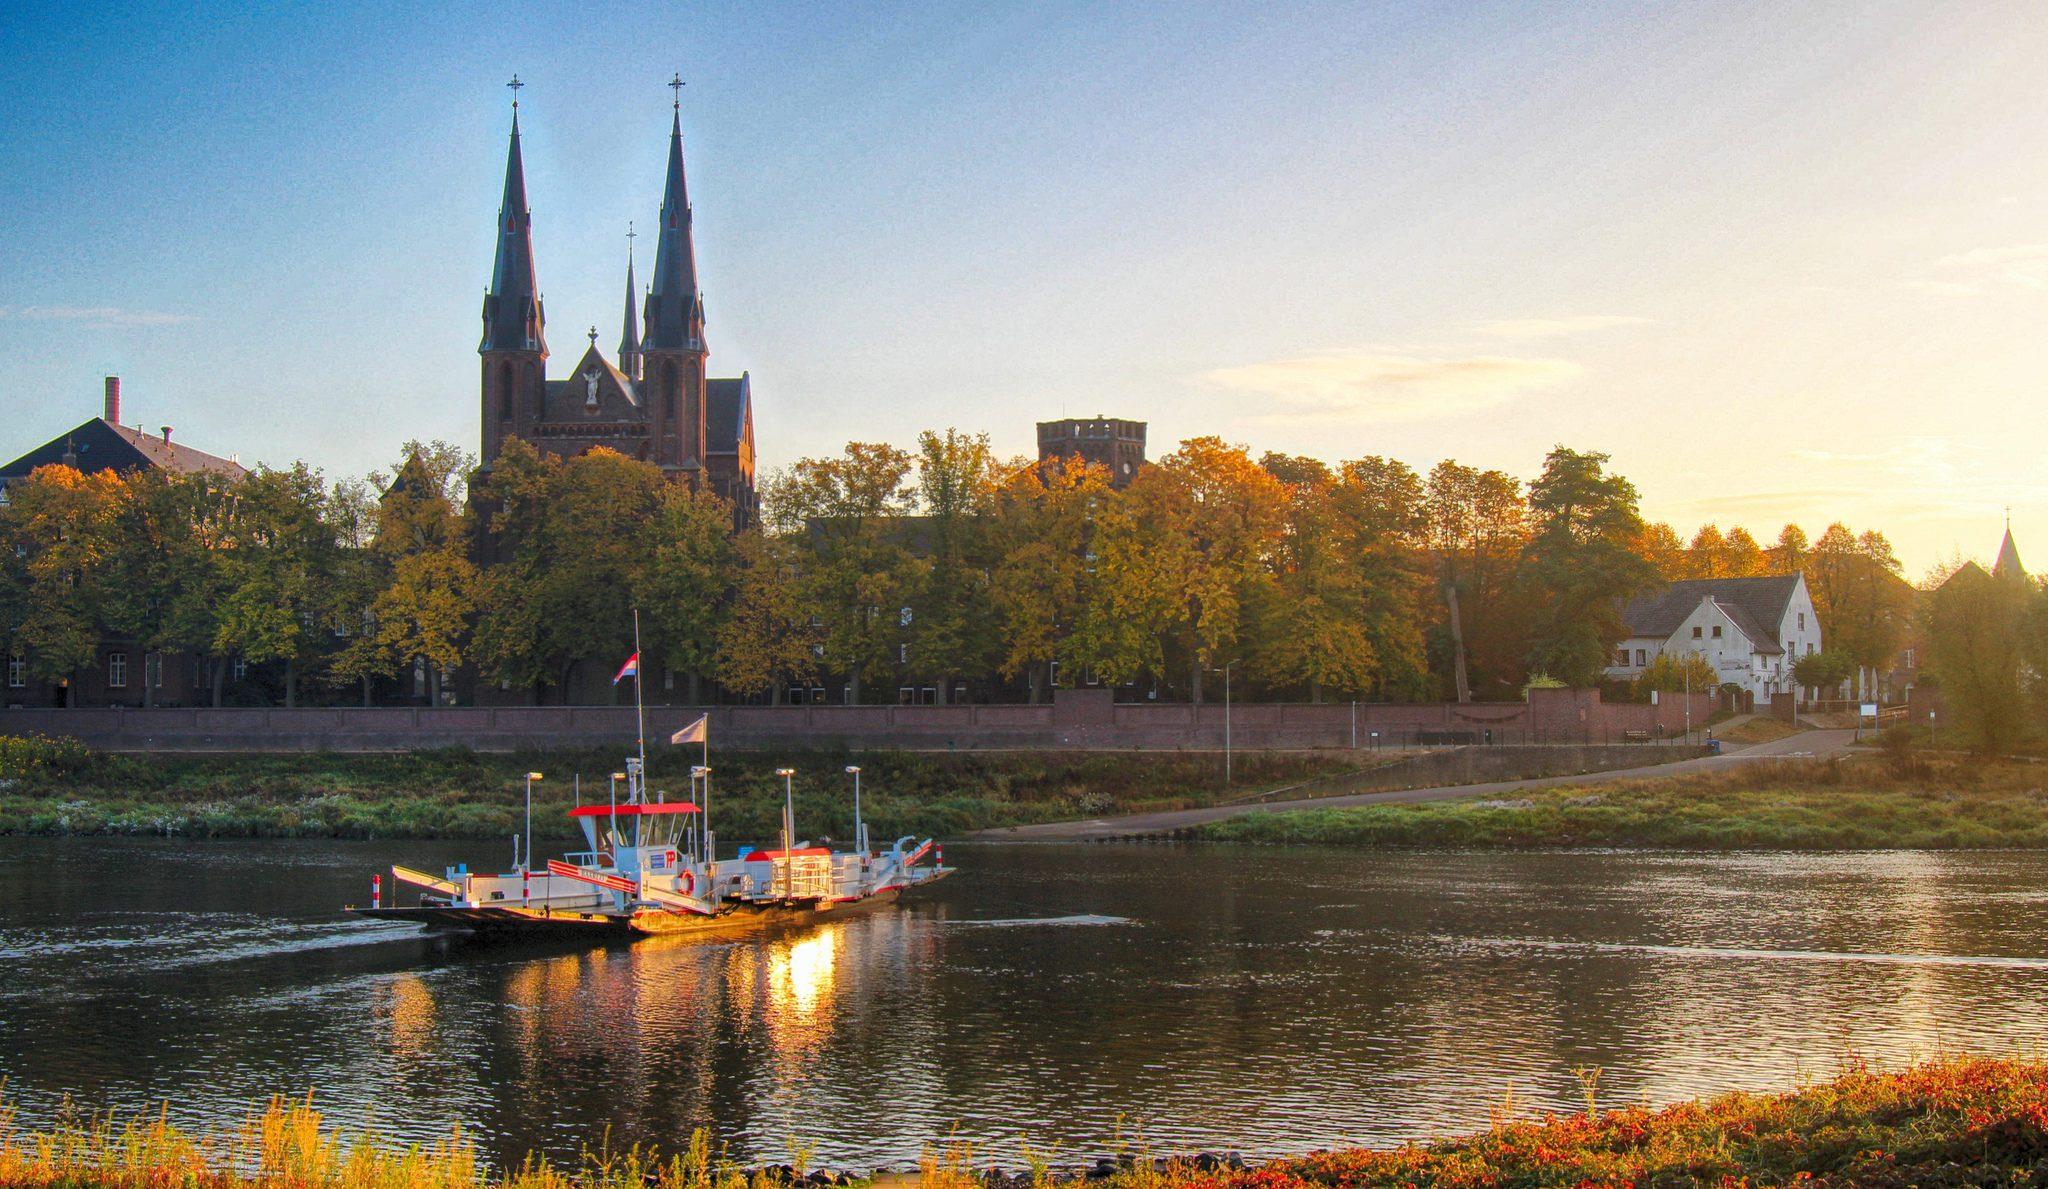 Waar Limburg greujts op is